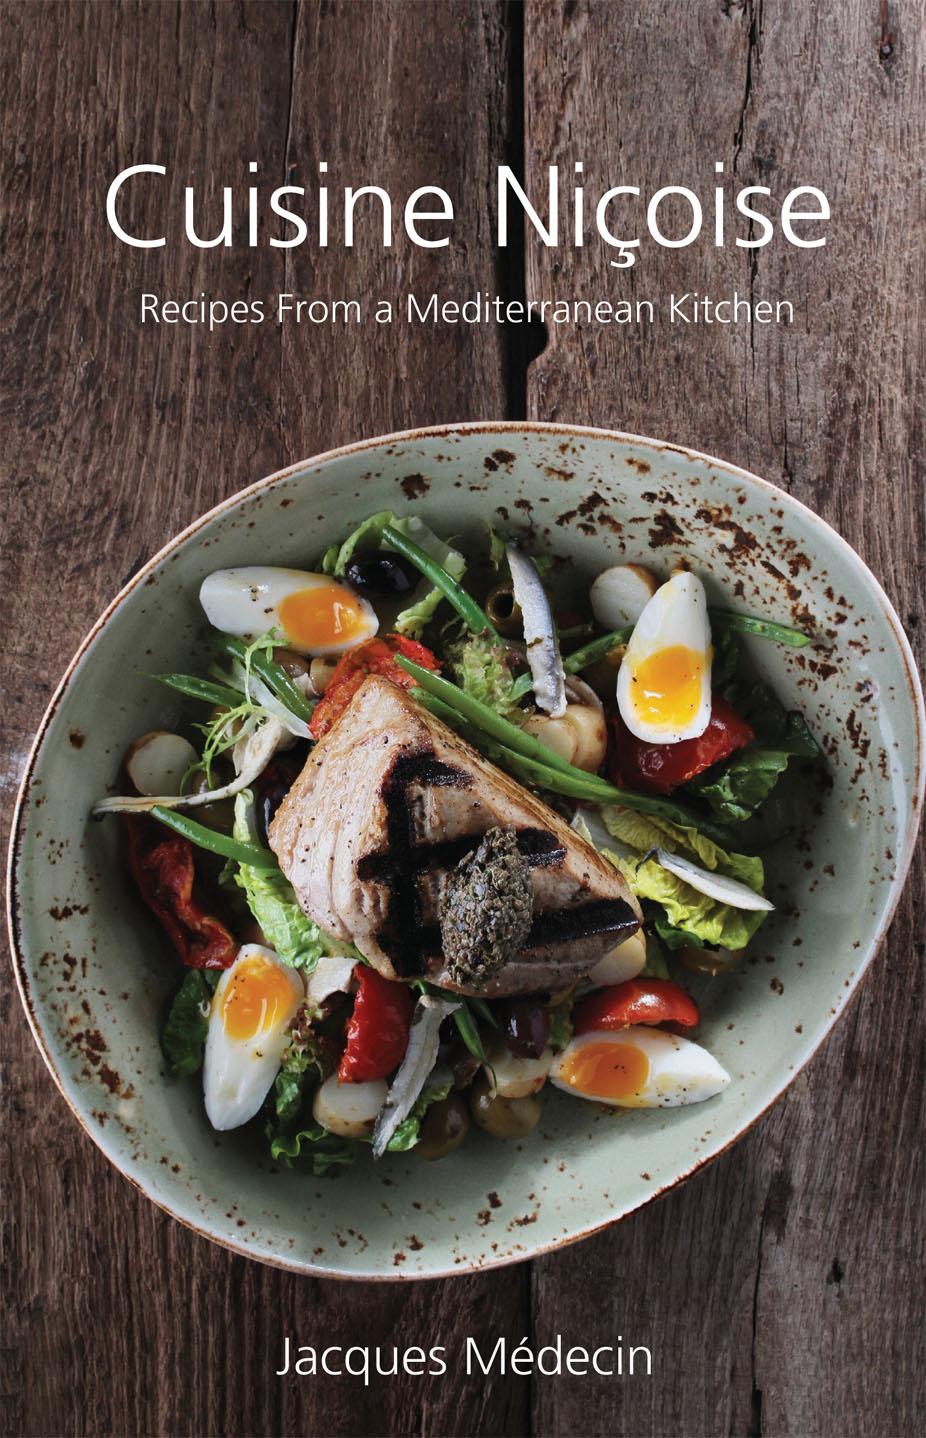 cuisine nicoise | grub street publishing